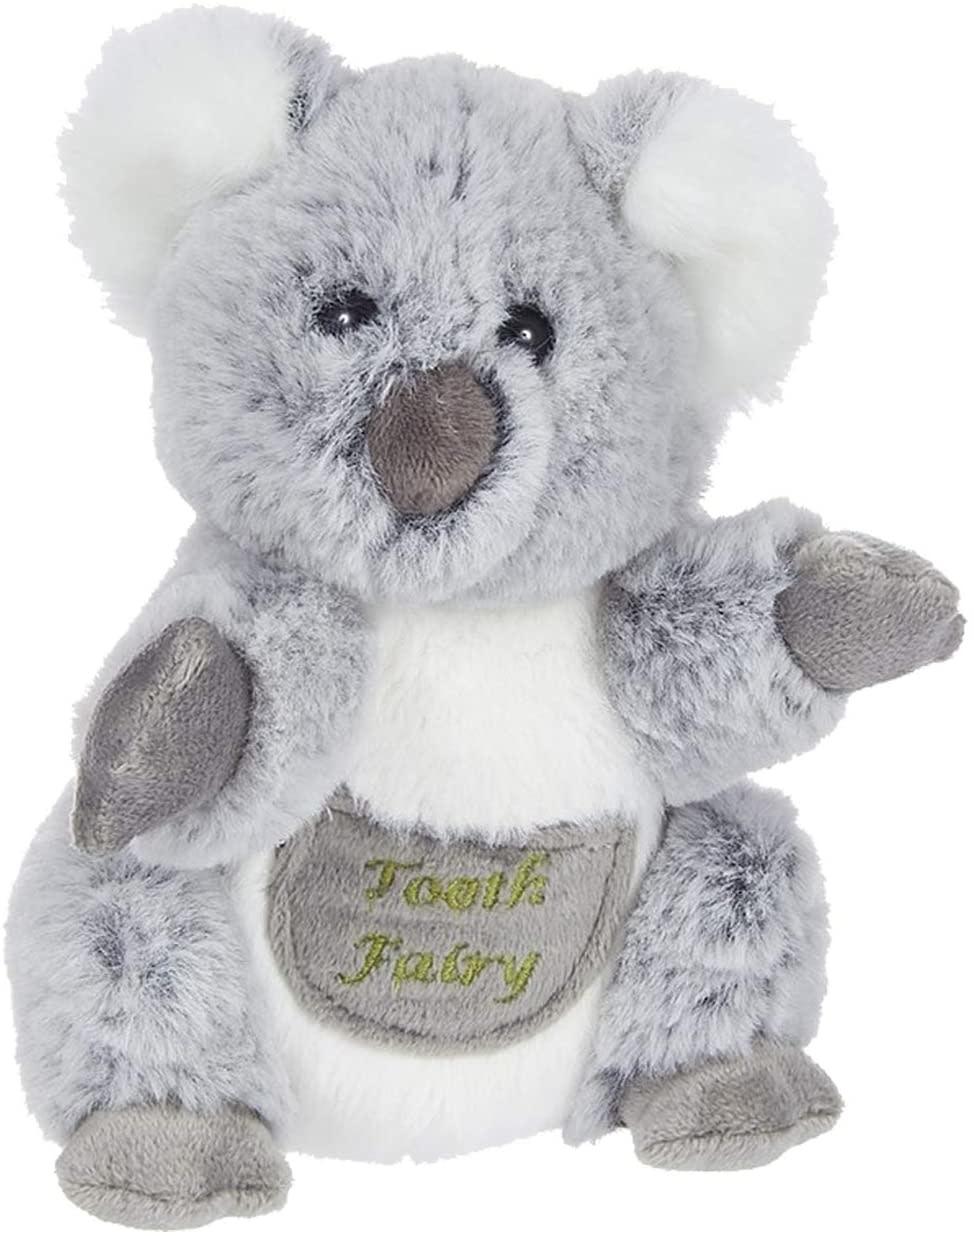 Maison Chic Tooth Fairy Pillow Sydney the Koala